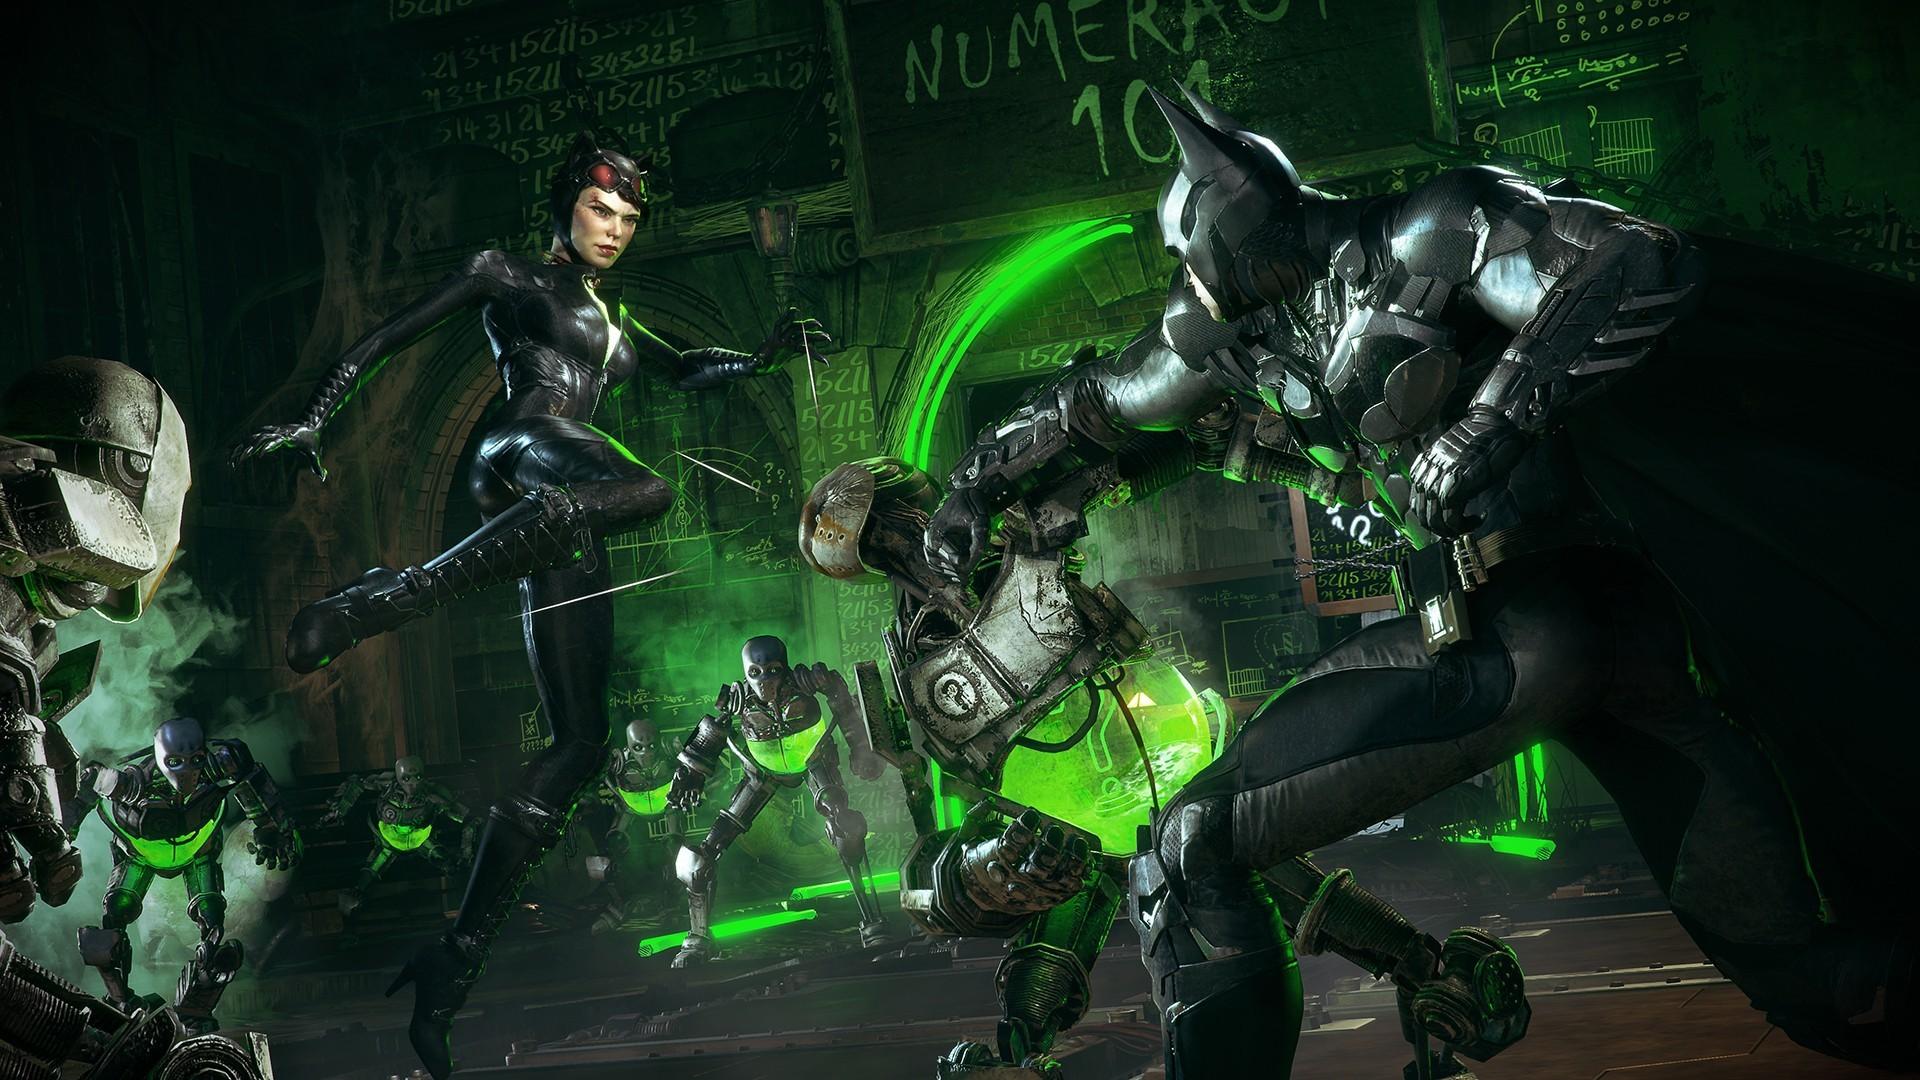 Arkham Knight Killing Batman Wallpaper Batman and Catwoman Wallpaper …